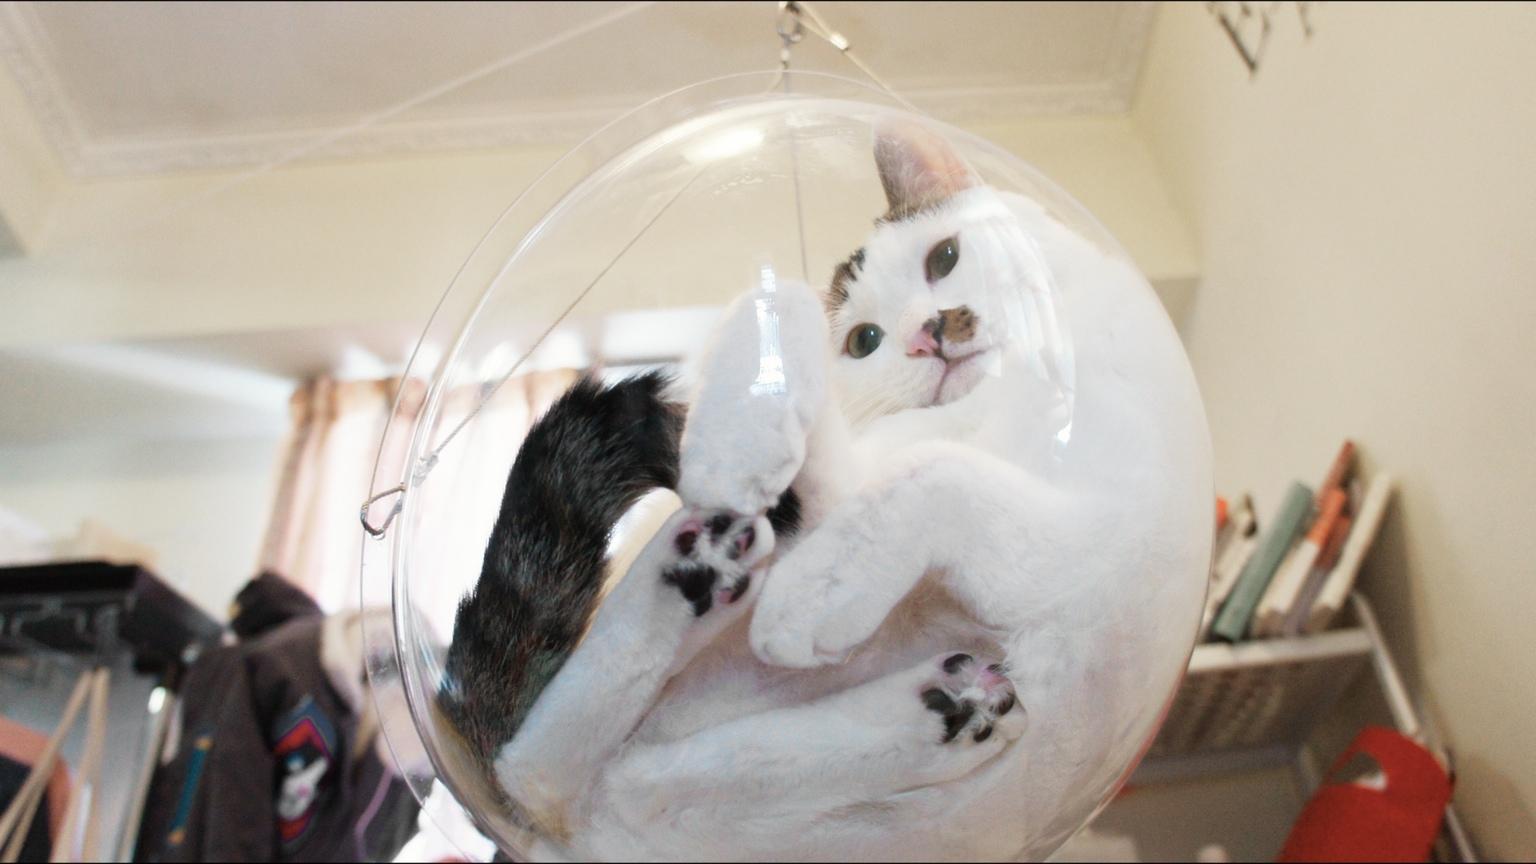 Astonishing The Dim Dim Bubble Bowl A Hanging Transparent Cat Bed That Customarchery Wood Chair Design Ideas Customarcherynet